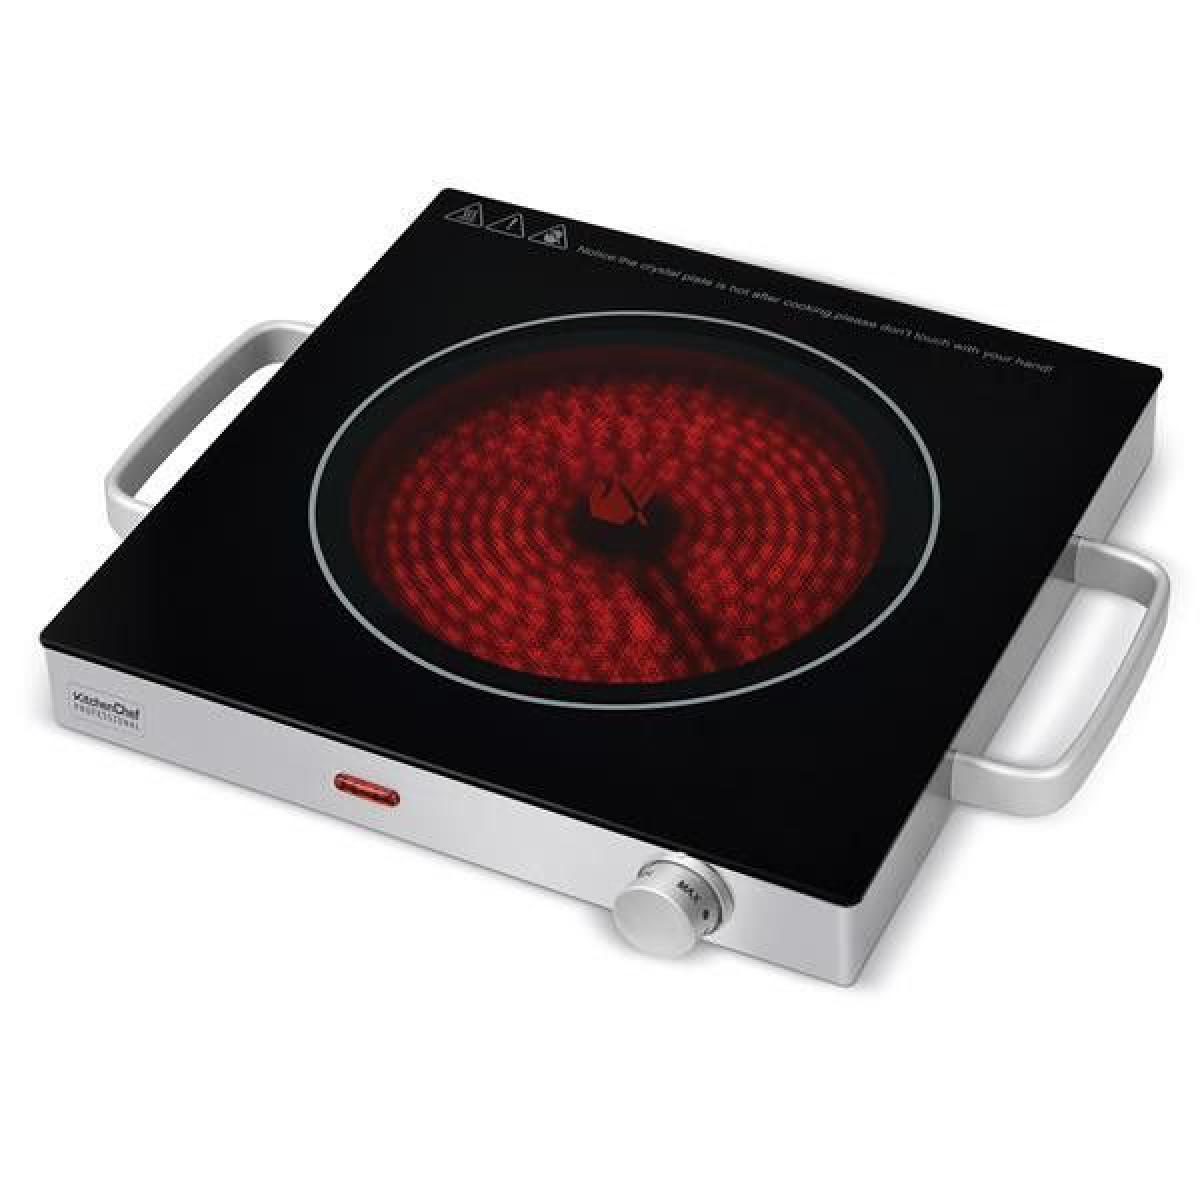 Kitchen Chef Plaque vitrocéramique KITCHENCHEF 2000W, KCPPV2000